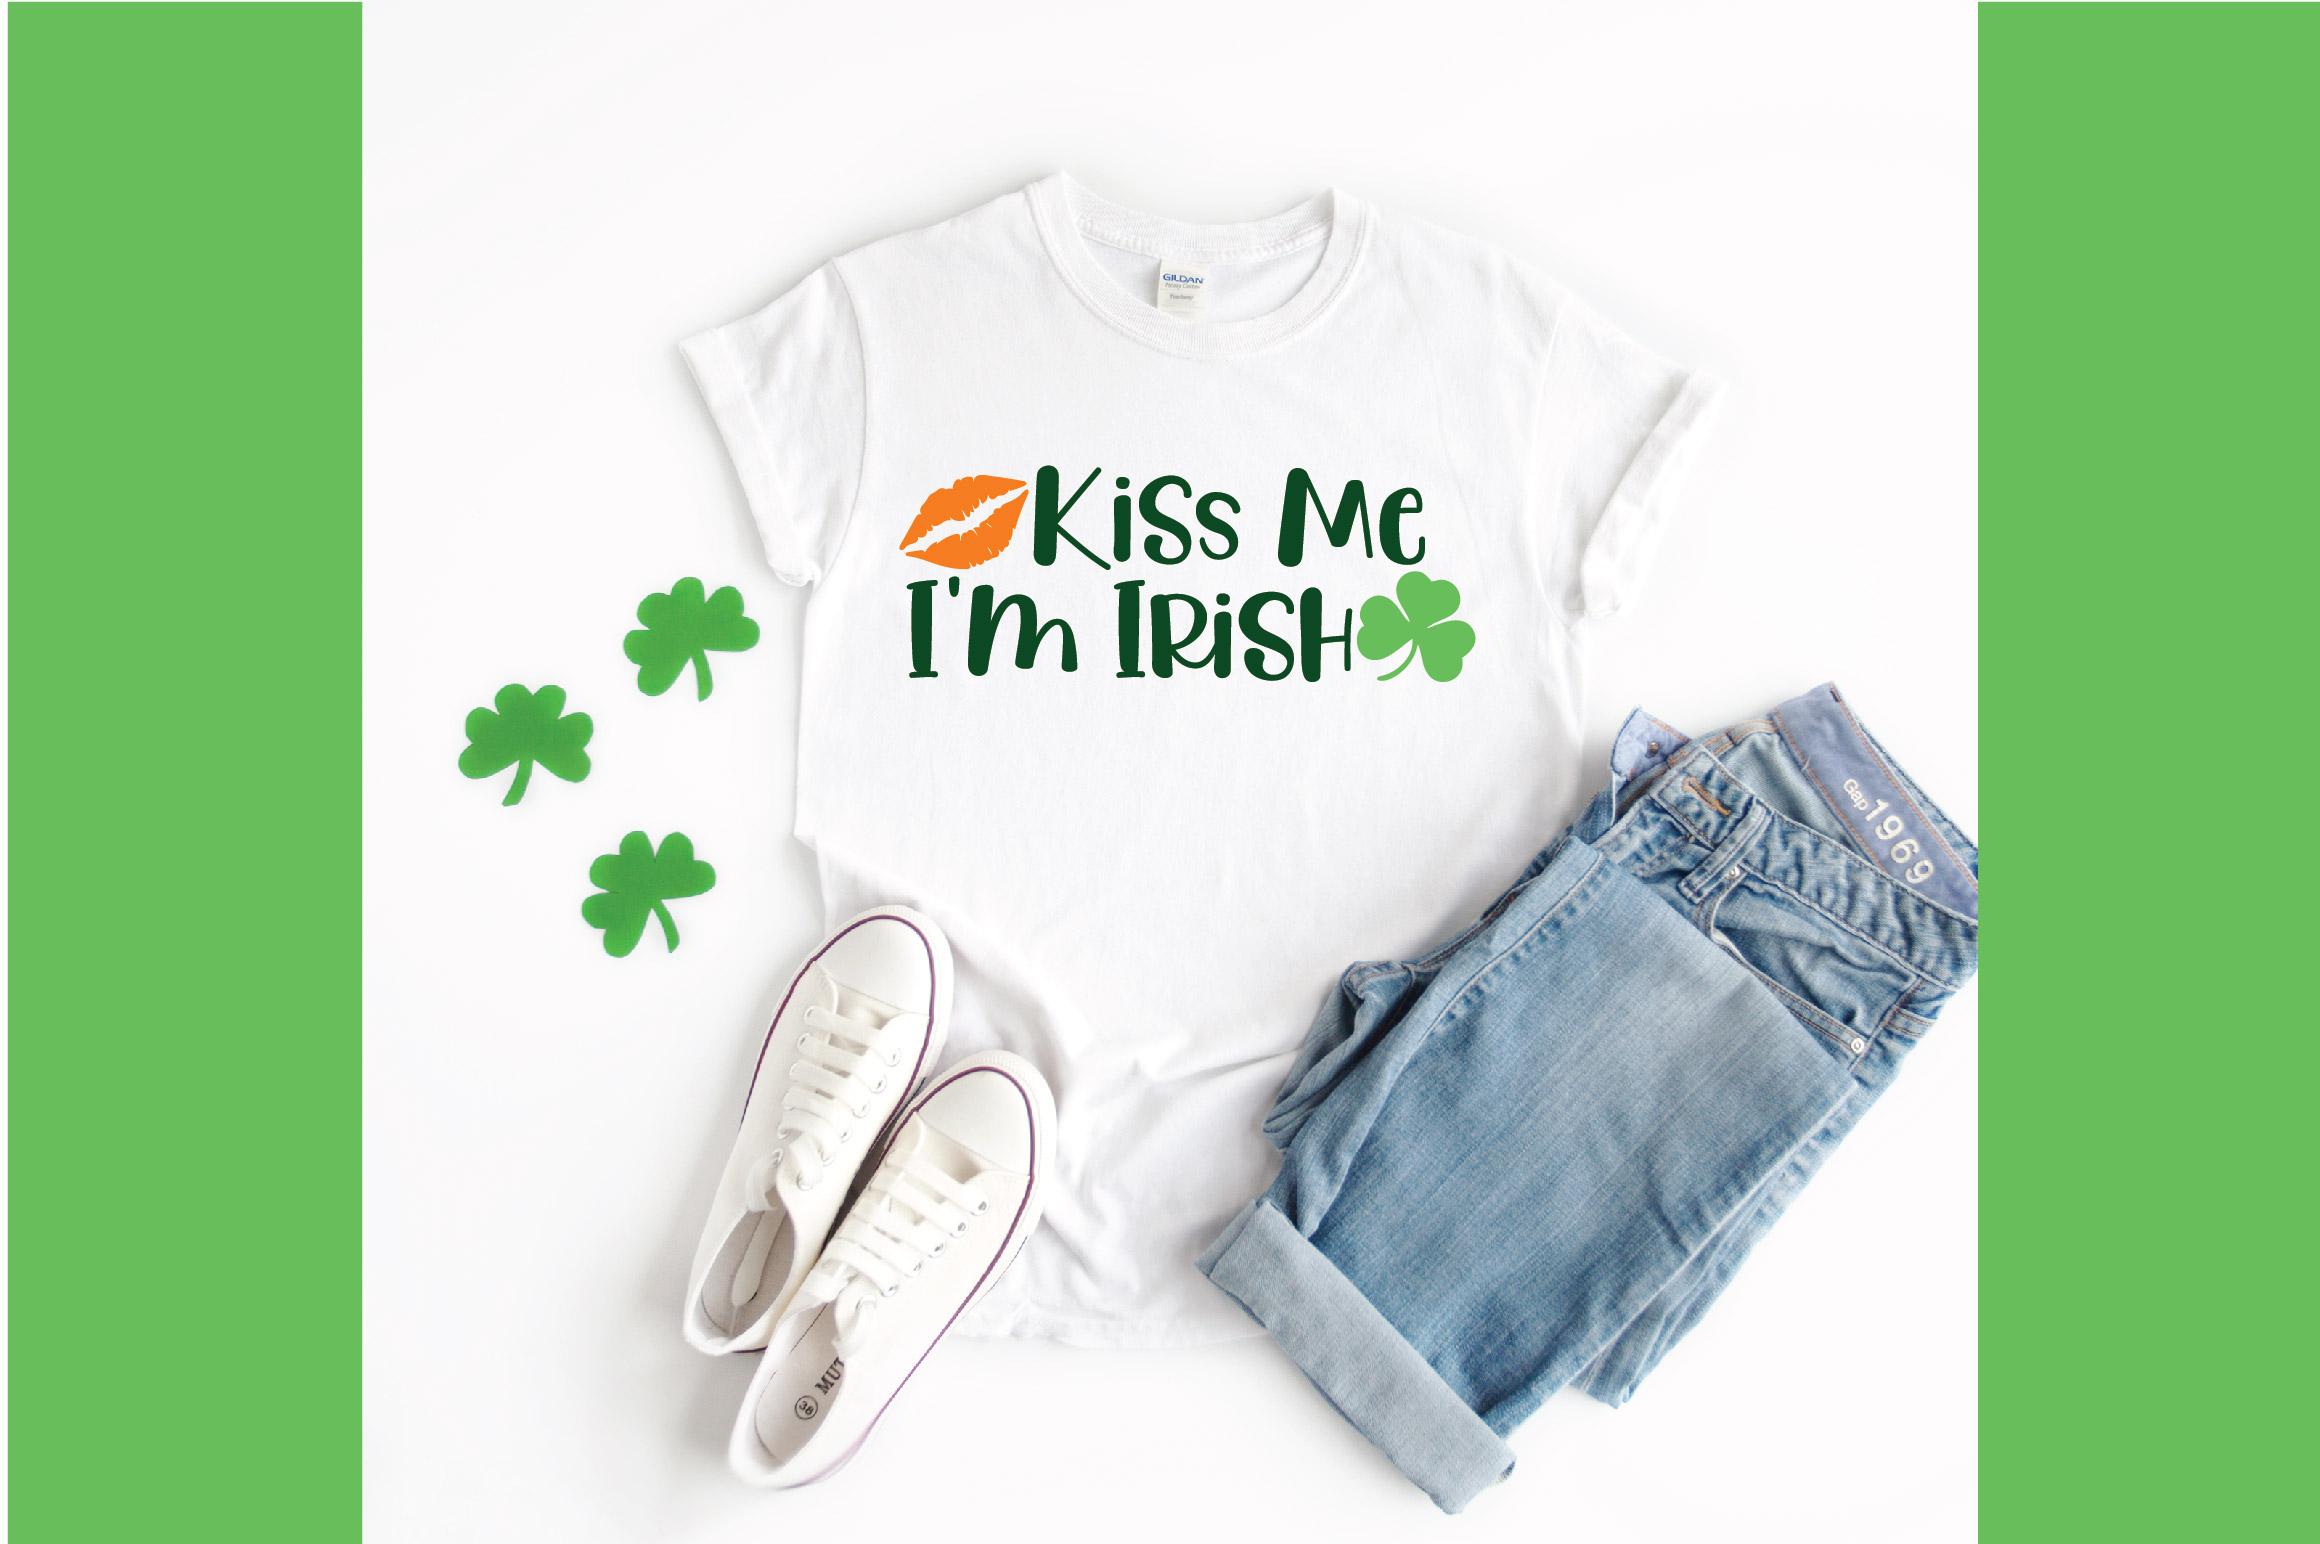 Kiss Me I'm Irish SVG Cut File - St. Patrick's Day SVG - DXF example image 2